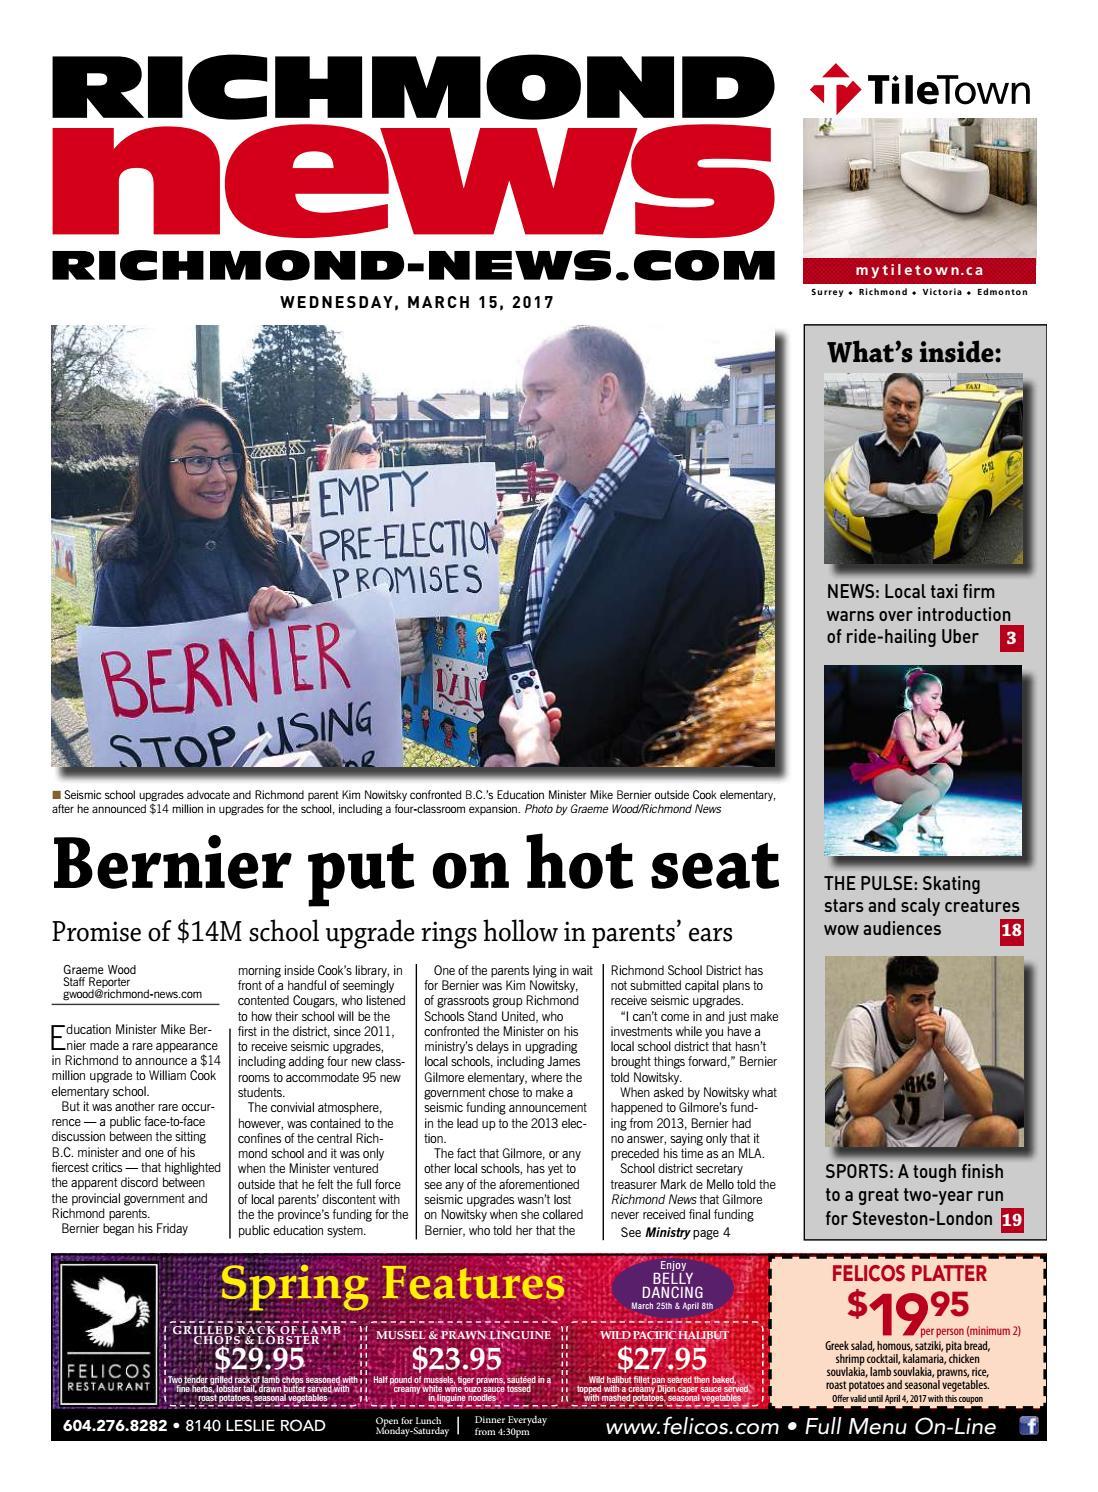 Richmond News March 15 2017 By Richmond News - Issuu